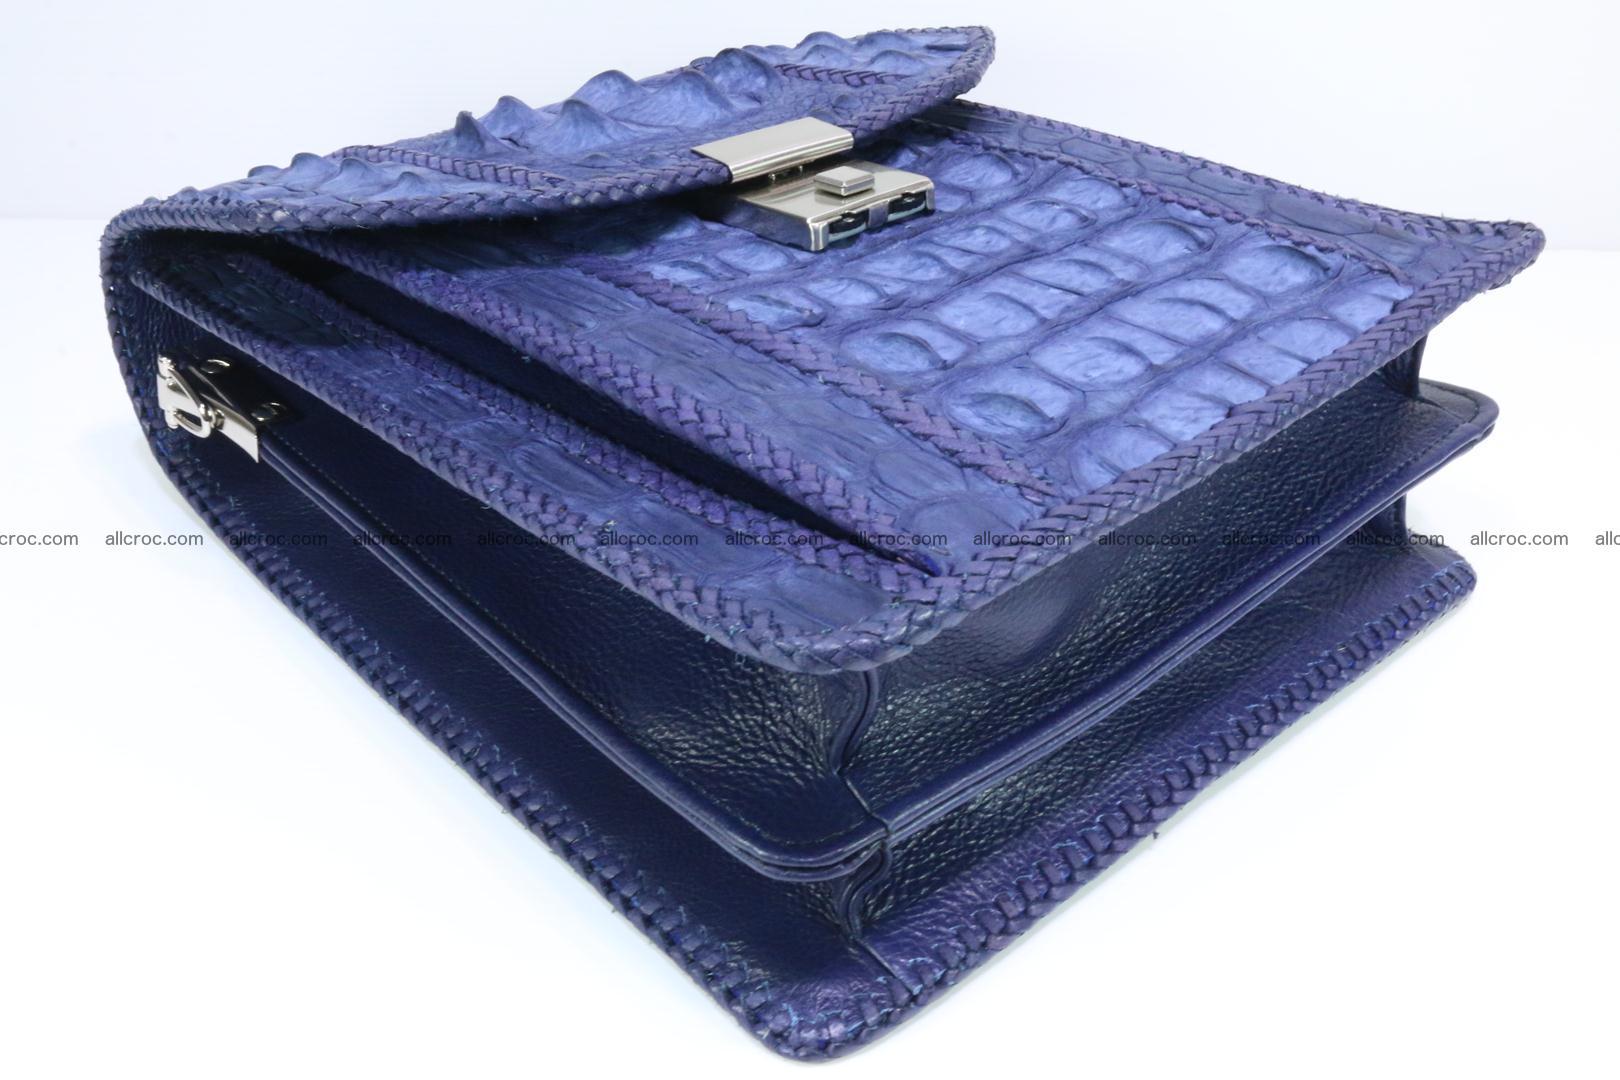 Crocodile skin messenger bag braided edges 422 Foto 10